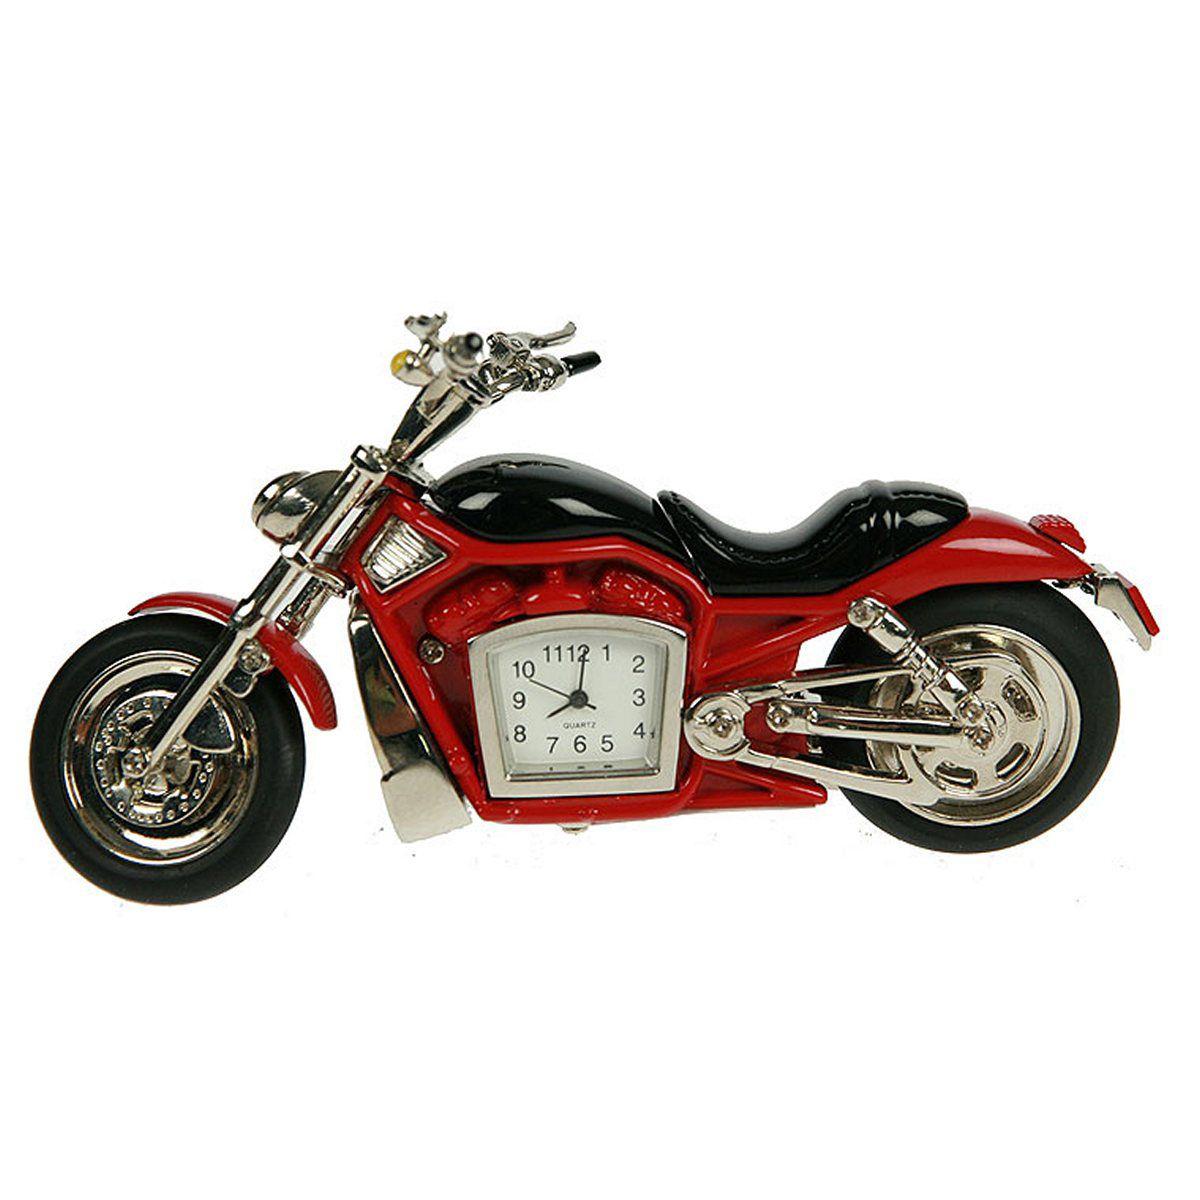 Часы настольные Русские Подарки Мотоцикл, 1 х 12 х 6 см. 2242322423